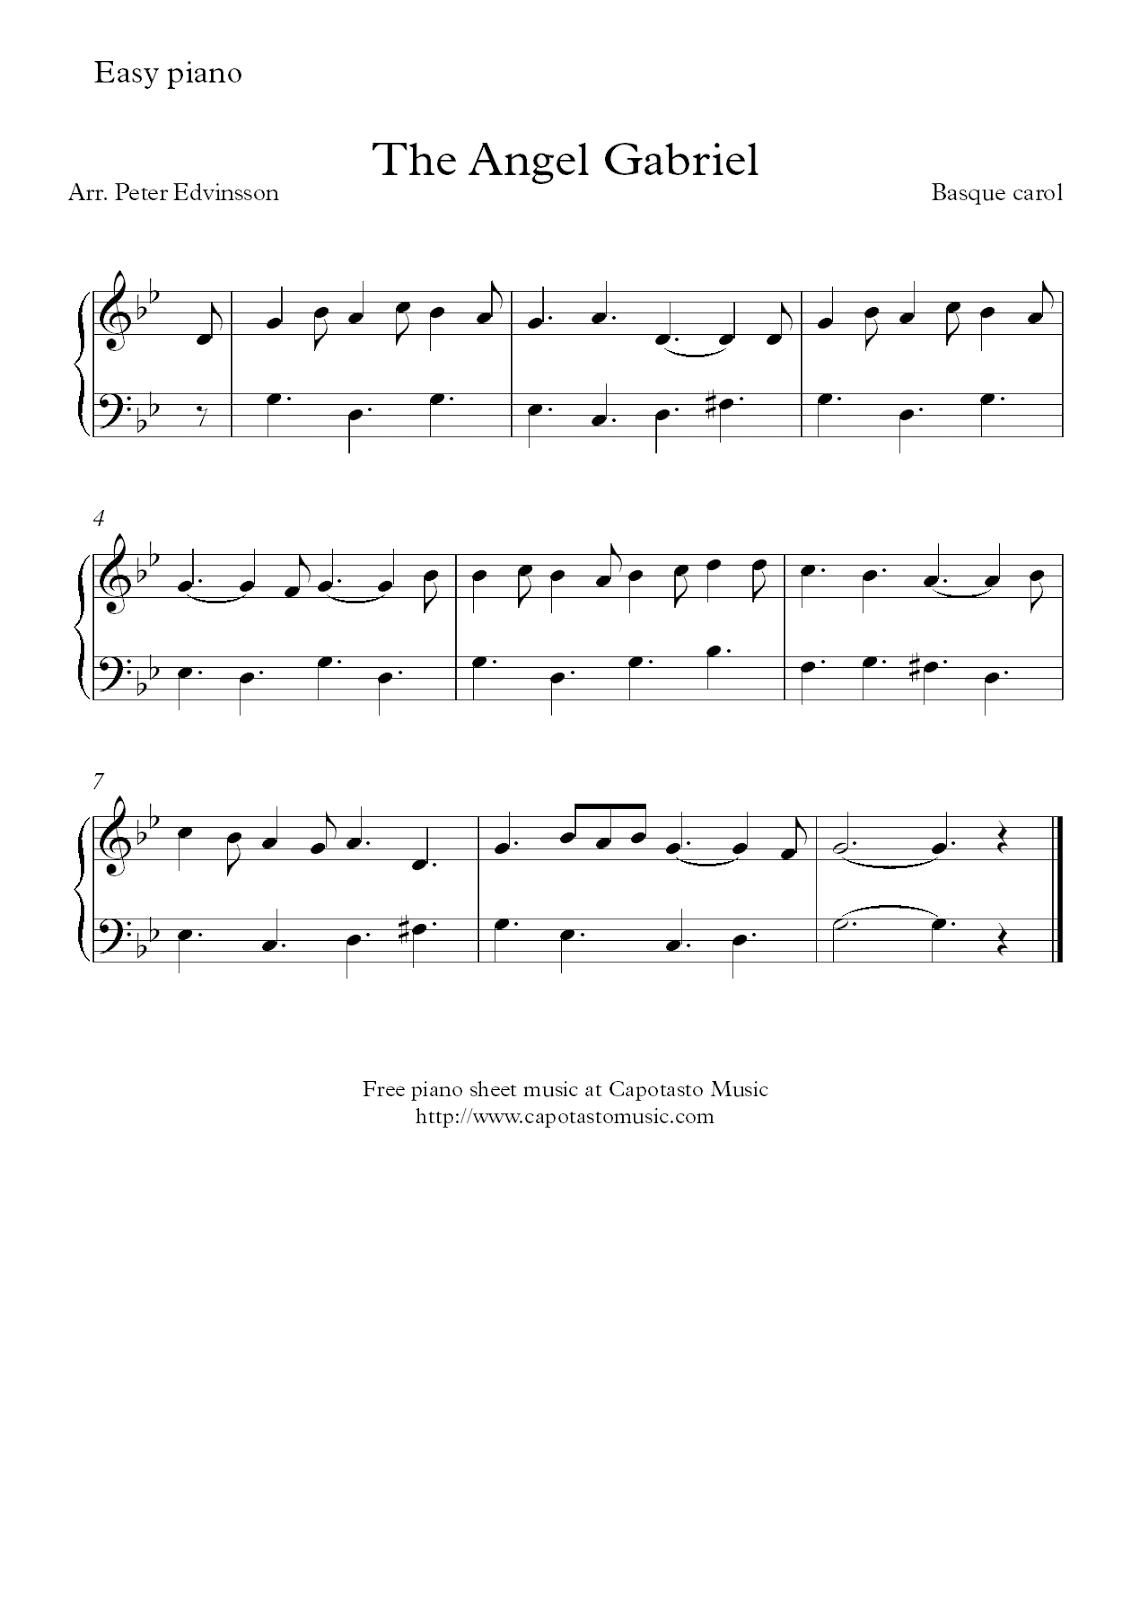 Free Christmas piano sheet music score, The Angel Gabriel